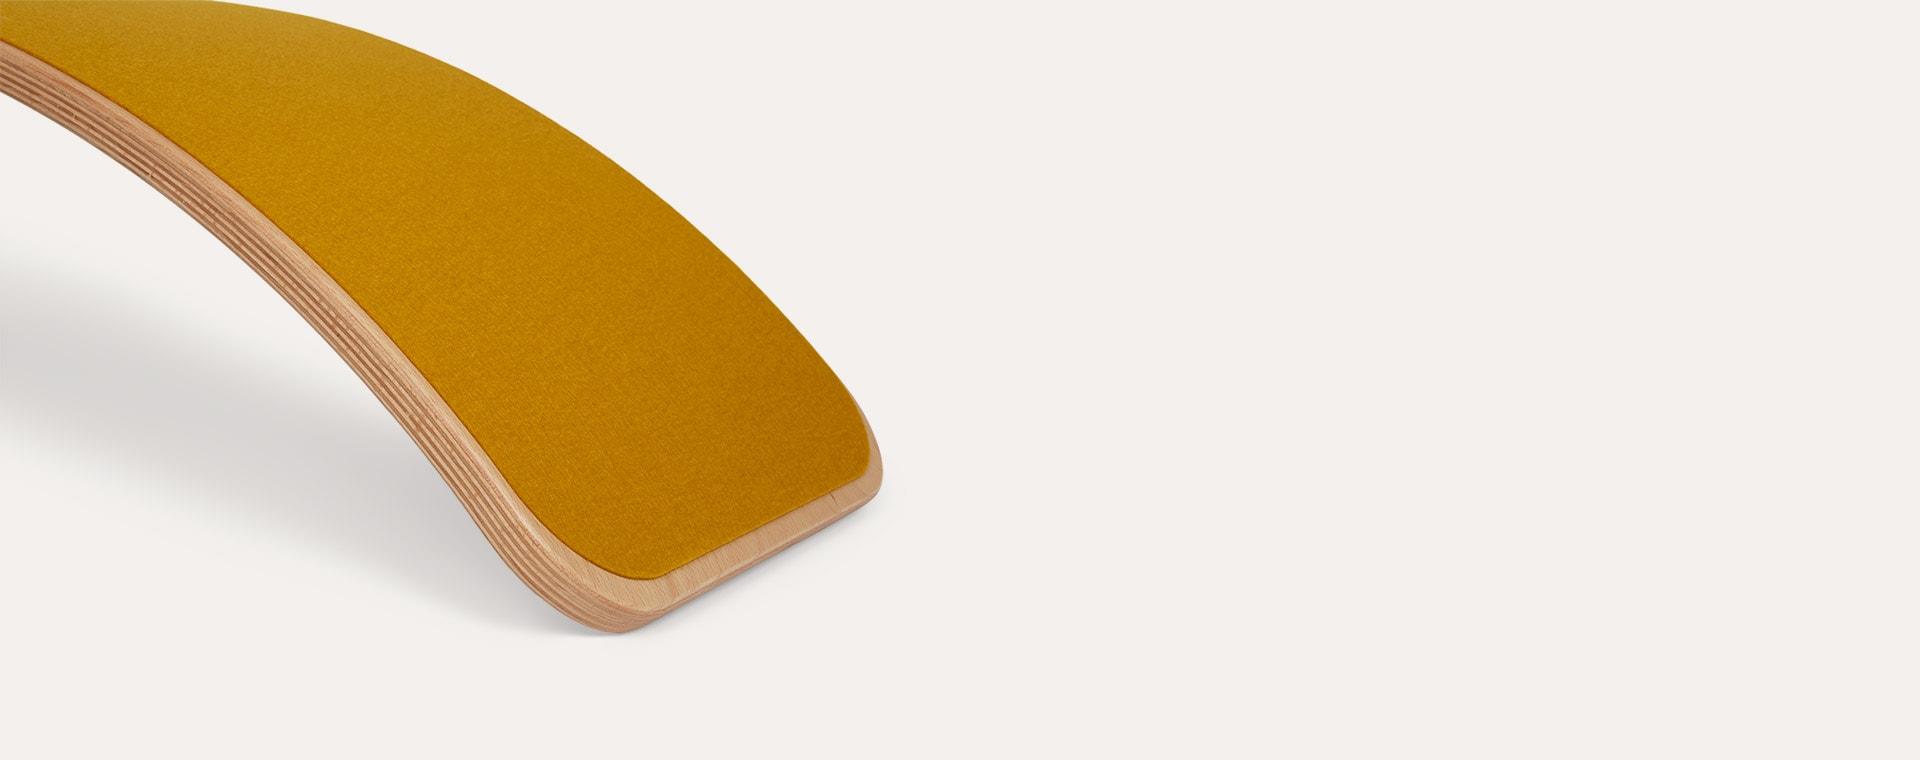 Mustard Felt Wobbel Wobbel Original Transparent